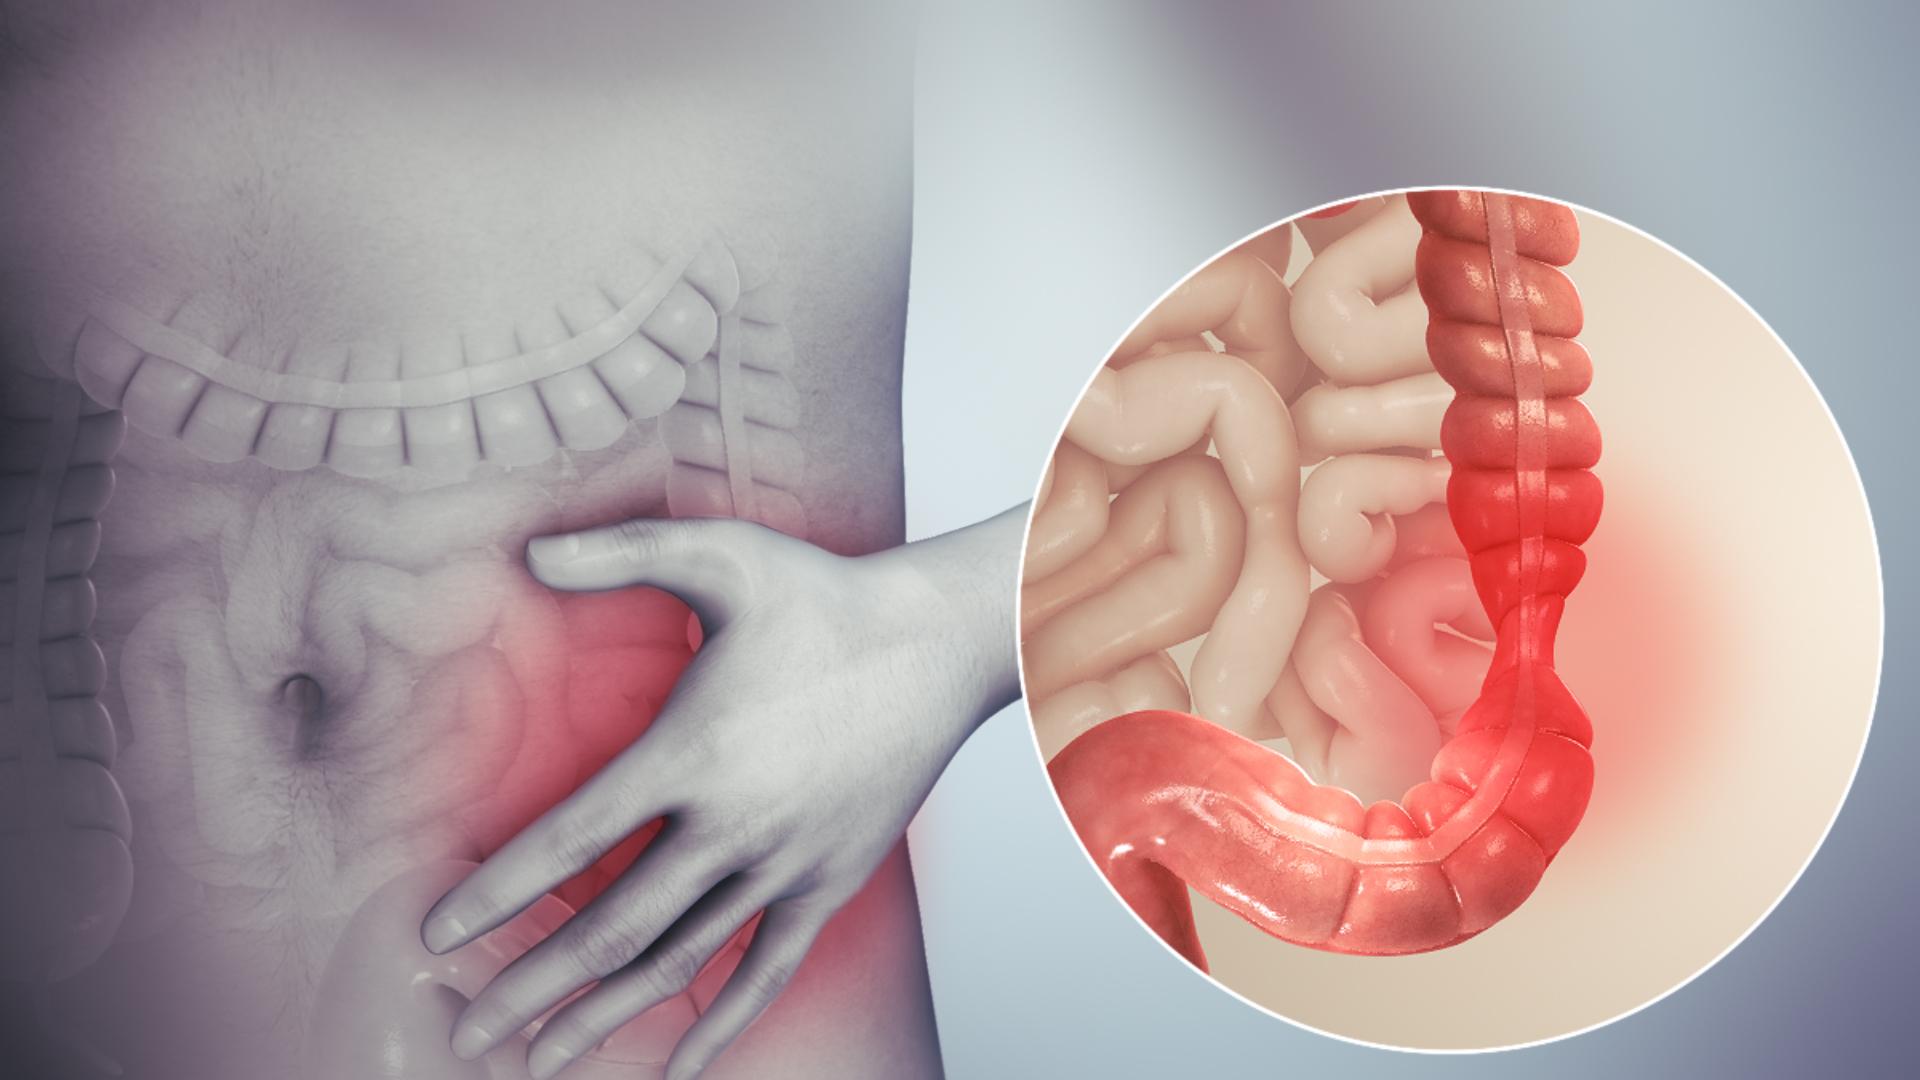 Giardia in humans nhs, Hpv szemolcs elleni ecsetelo